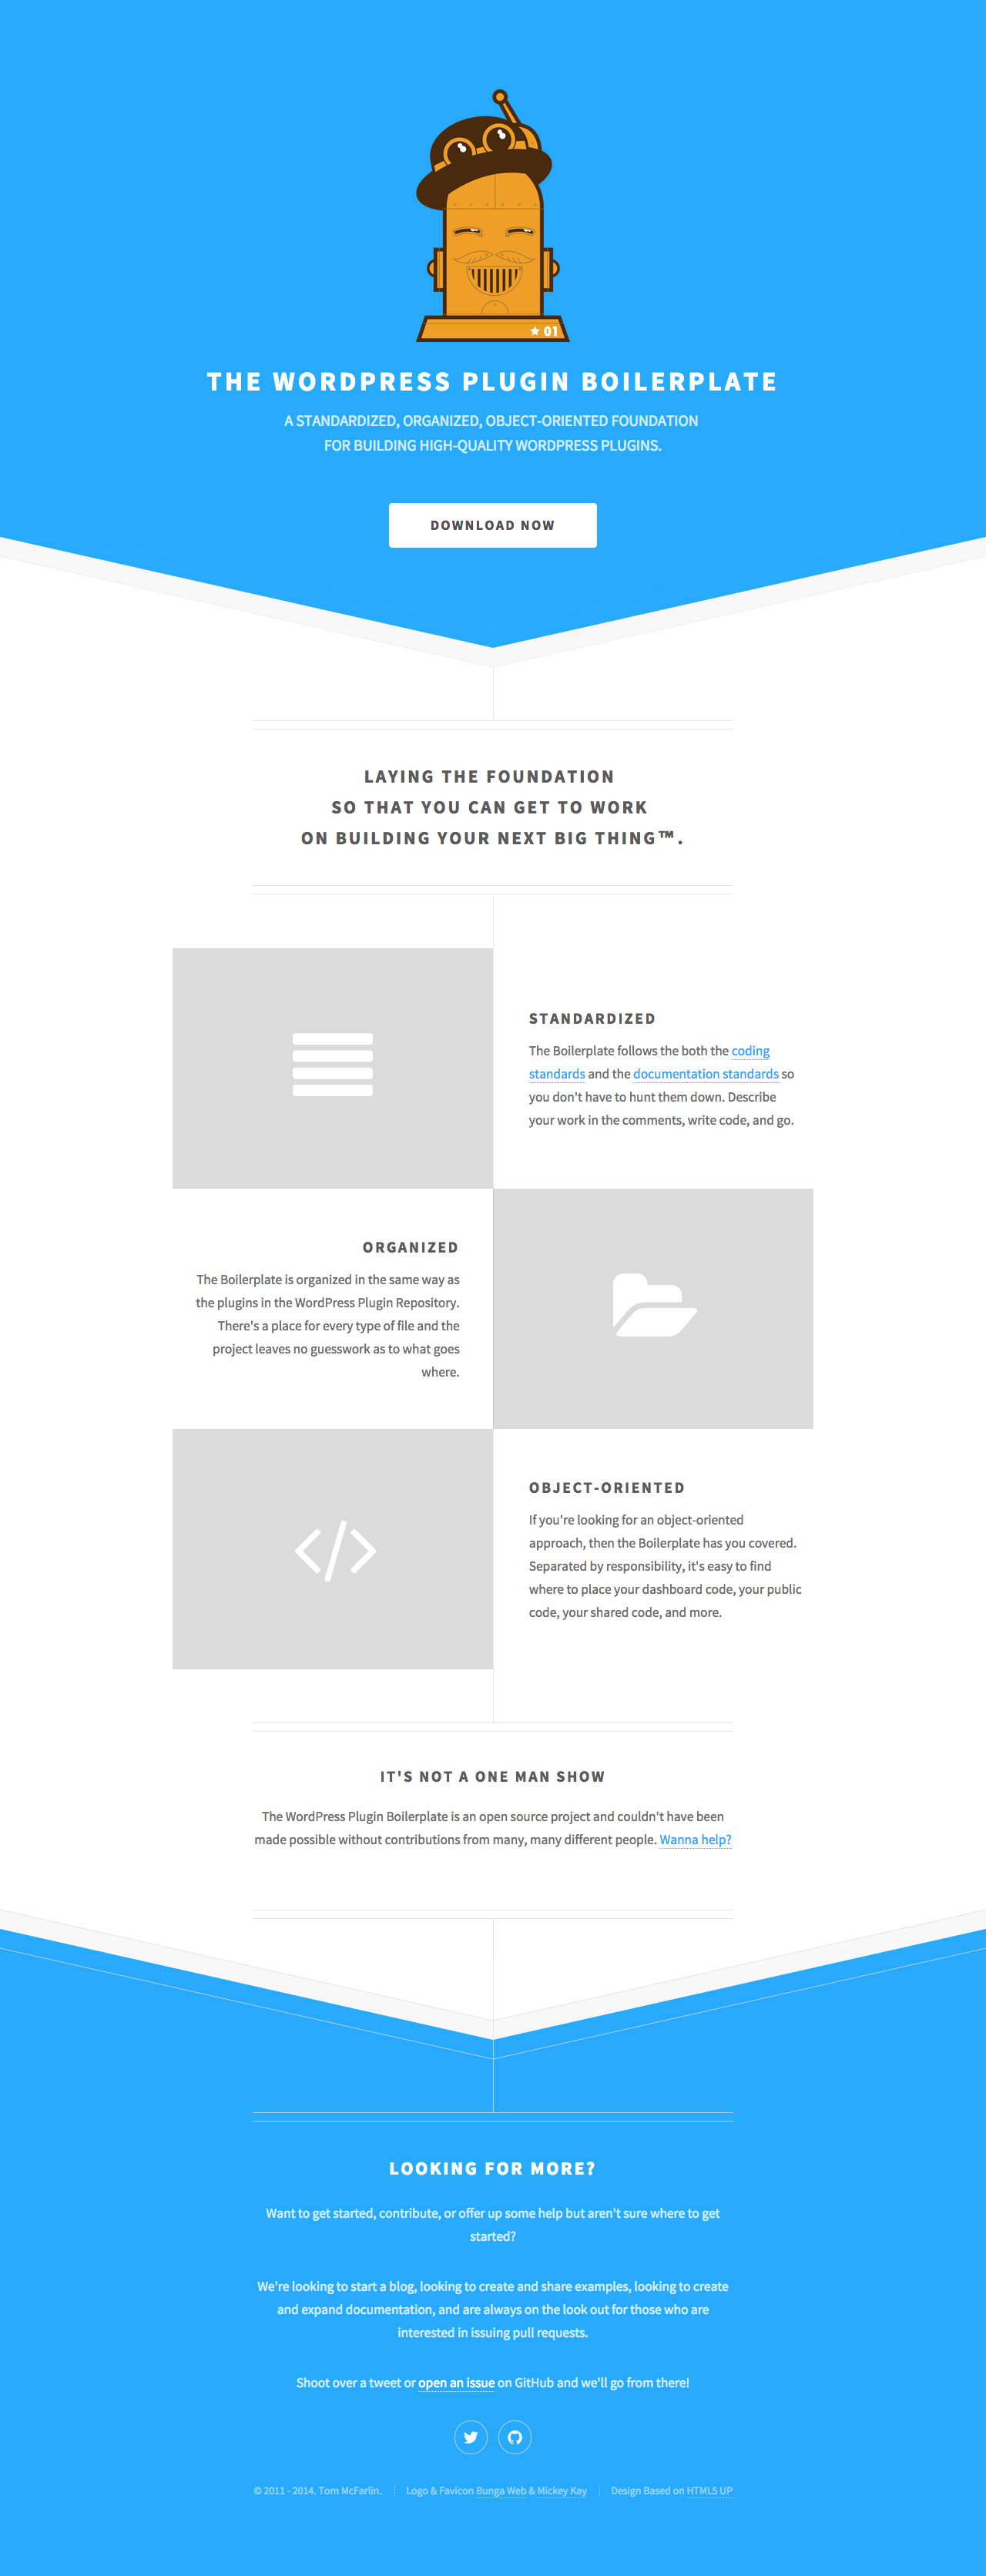 The WordPress Plugin Boilerplate Website Screenshot